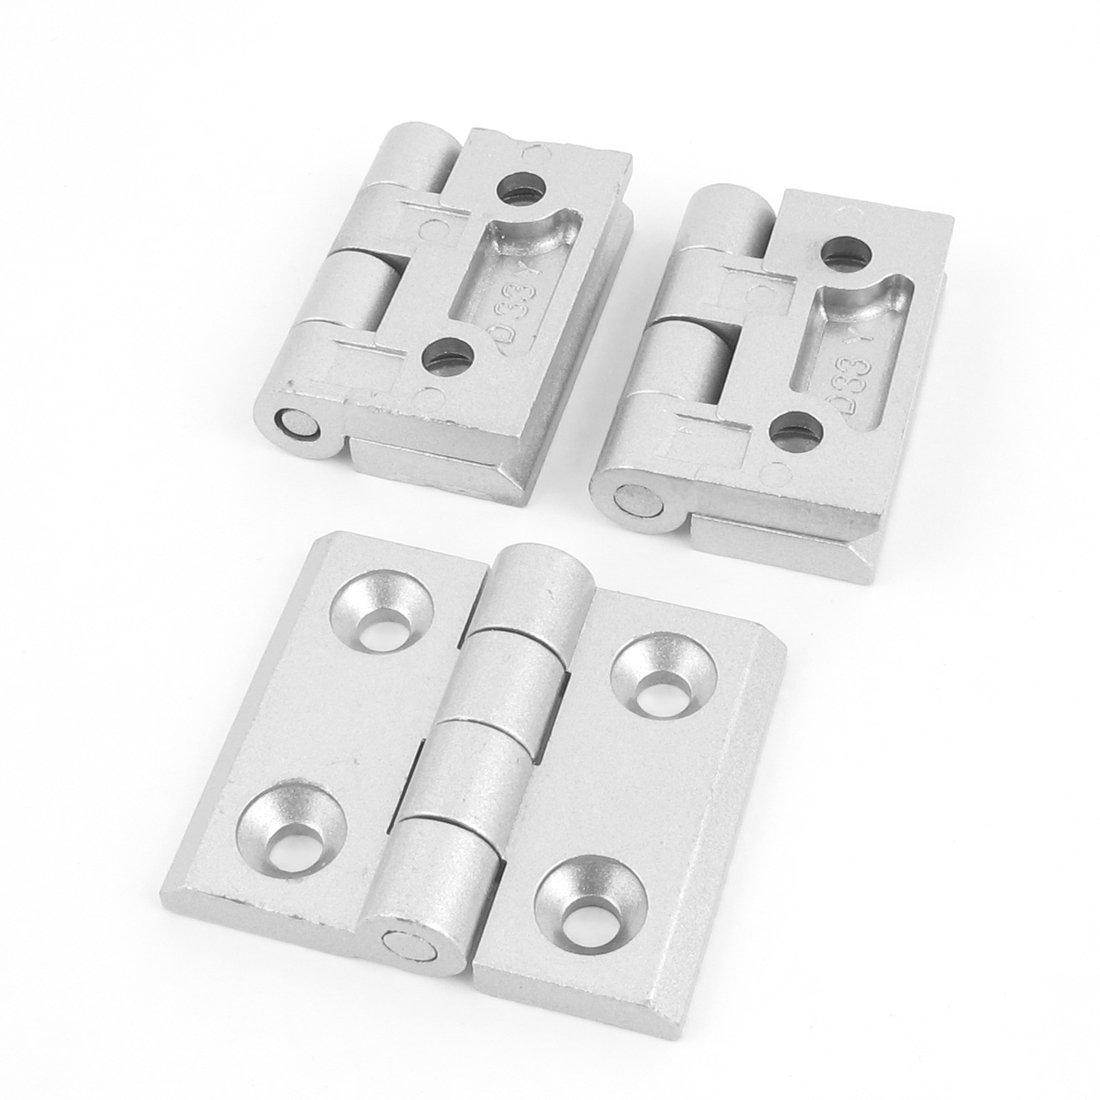 uxcell Gate Aluminum Alloy Weldable Door Butt Hinge Silver Tone 3pcs